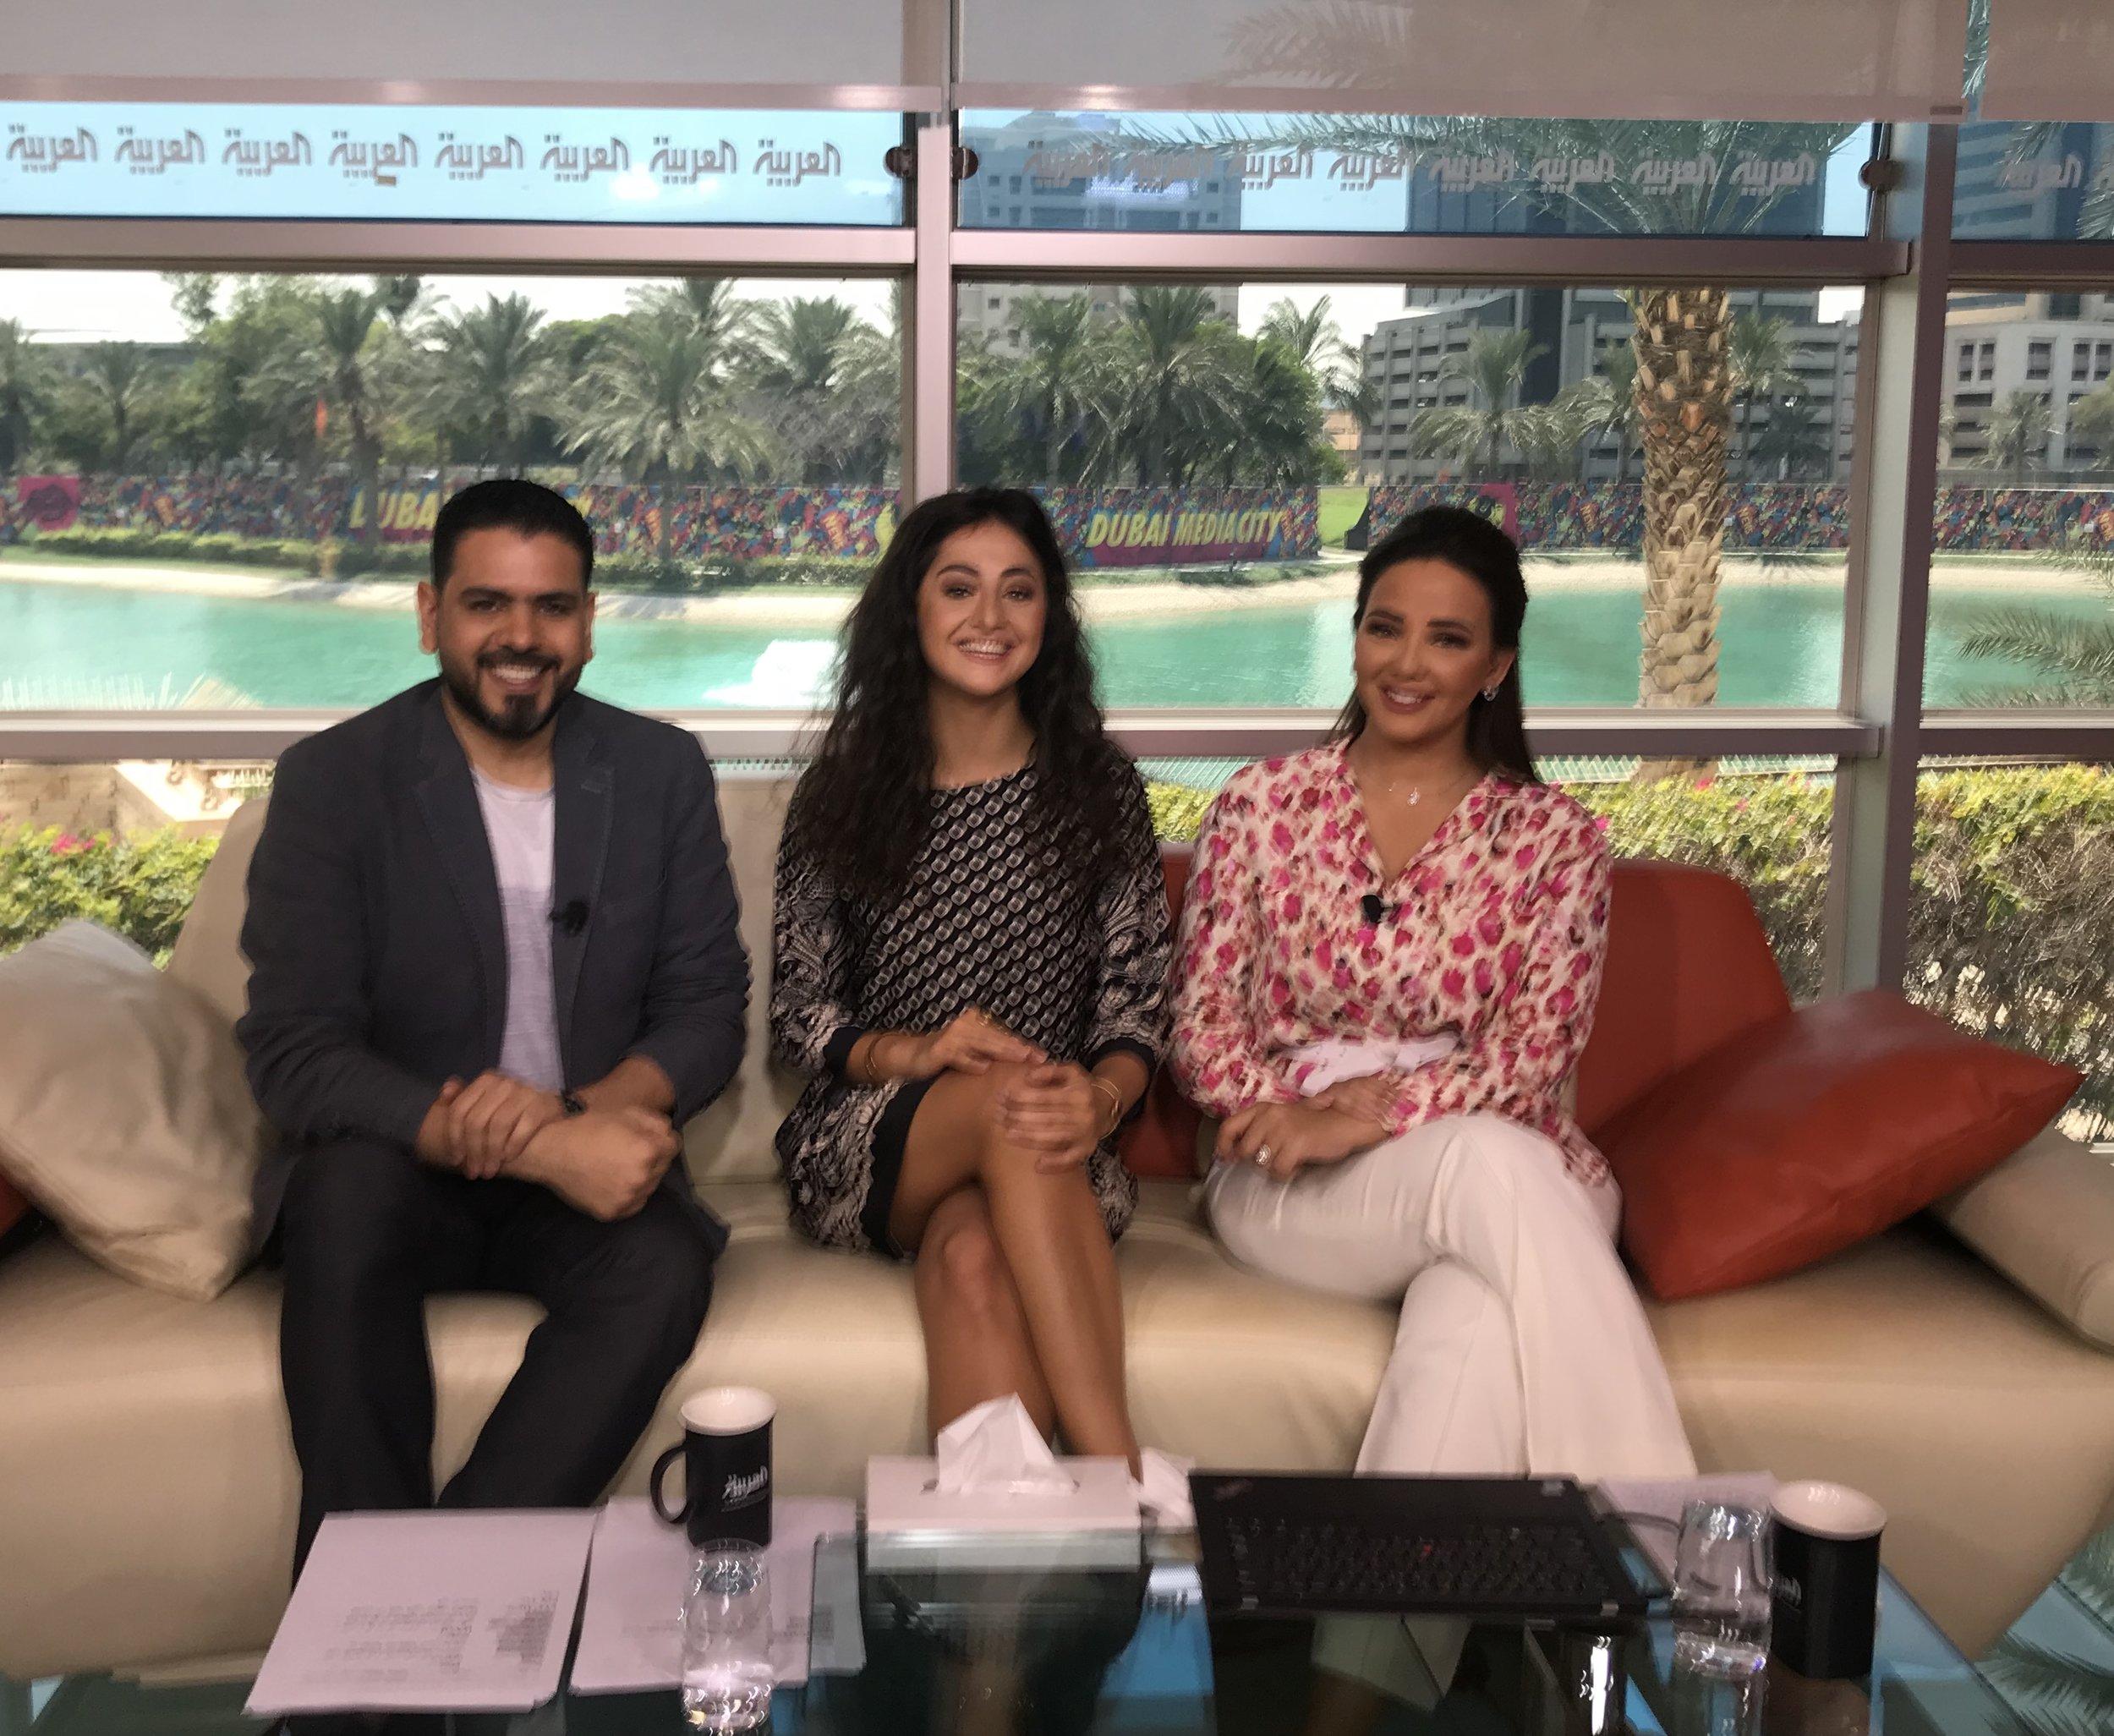 A Short interview with Syiran artist Noor bahjat at Sabah al arabiya - 2019-Clip